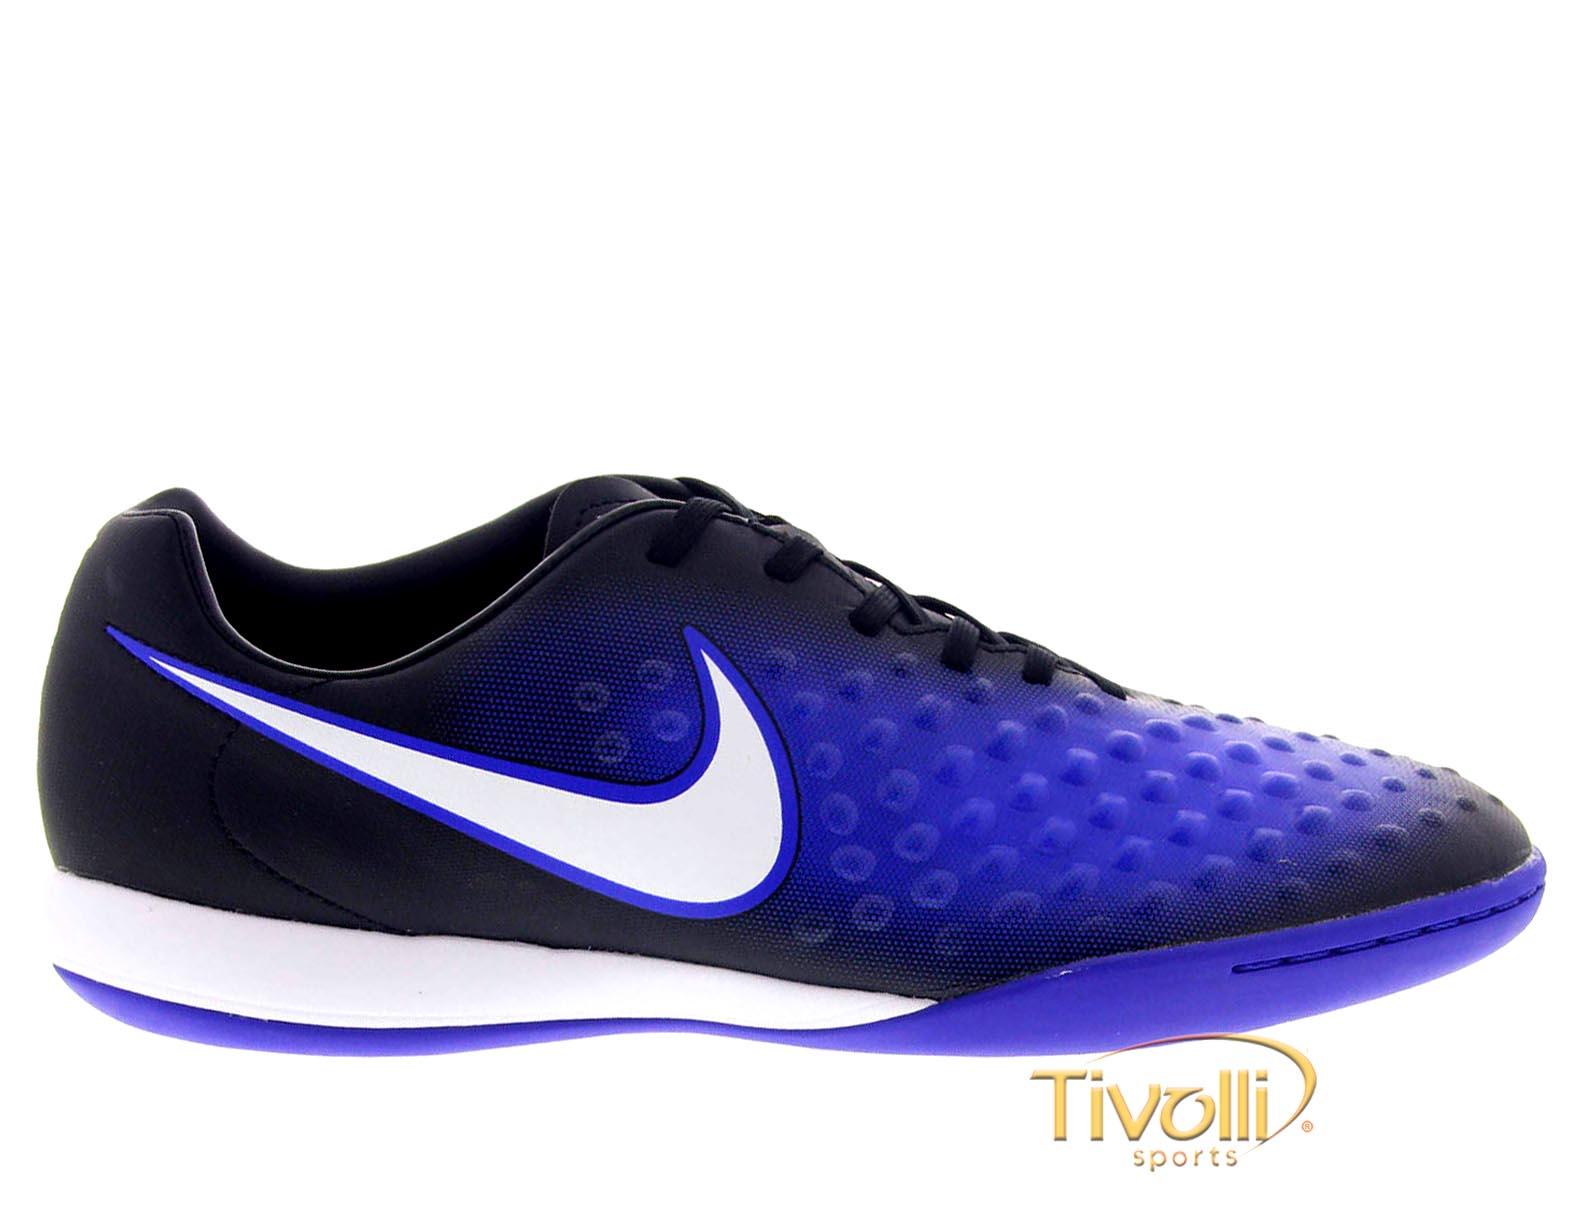 Chuteira Nike MagistaX Onda II IC Futsal     6e0ab1ba87c20